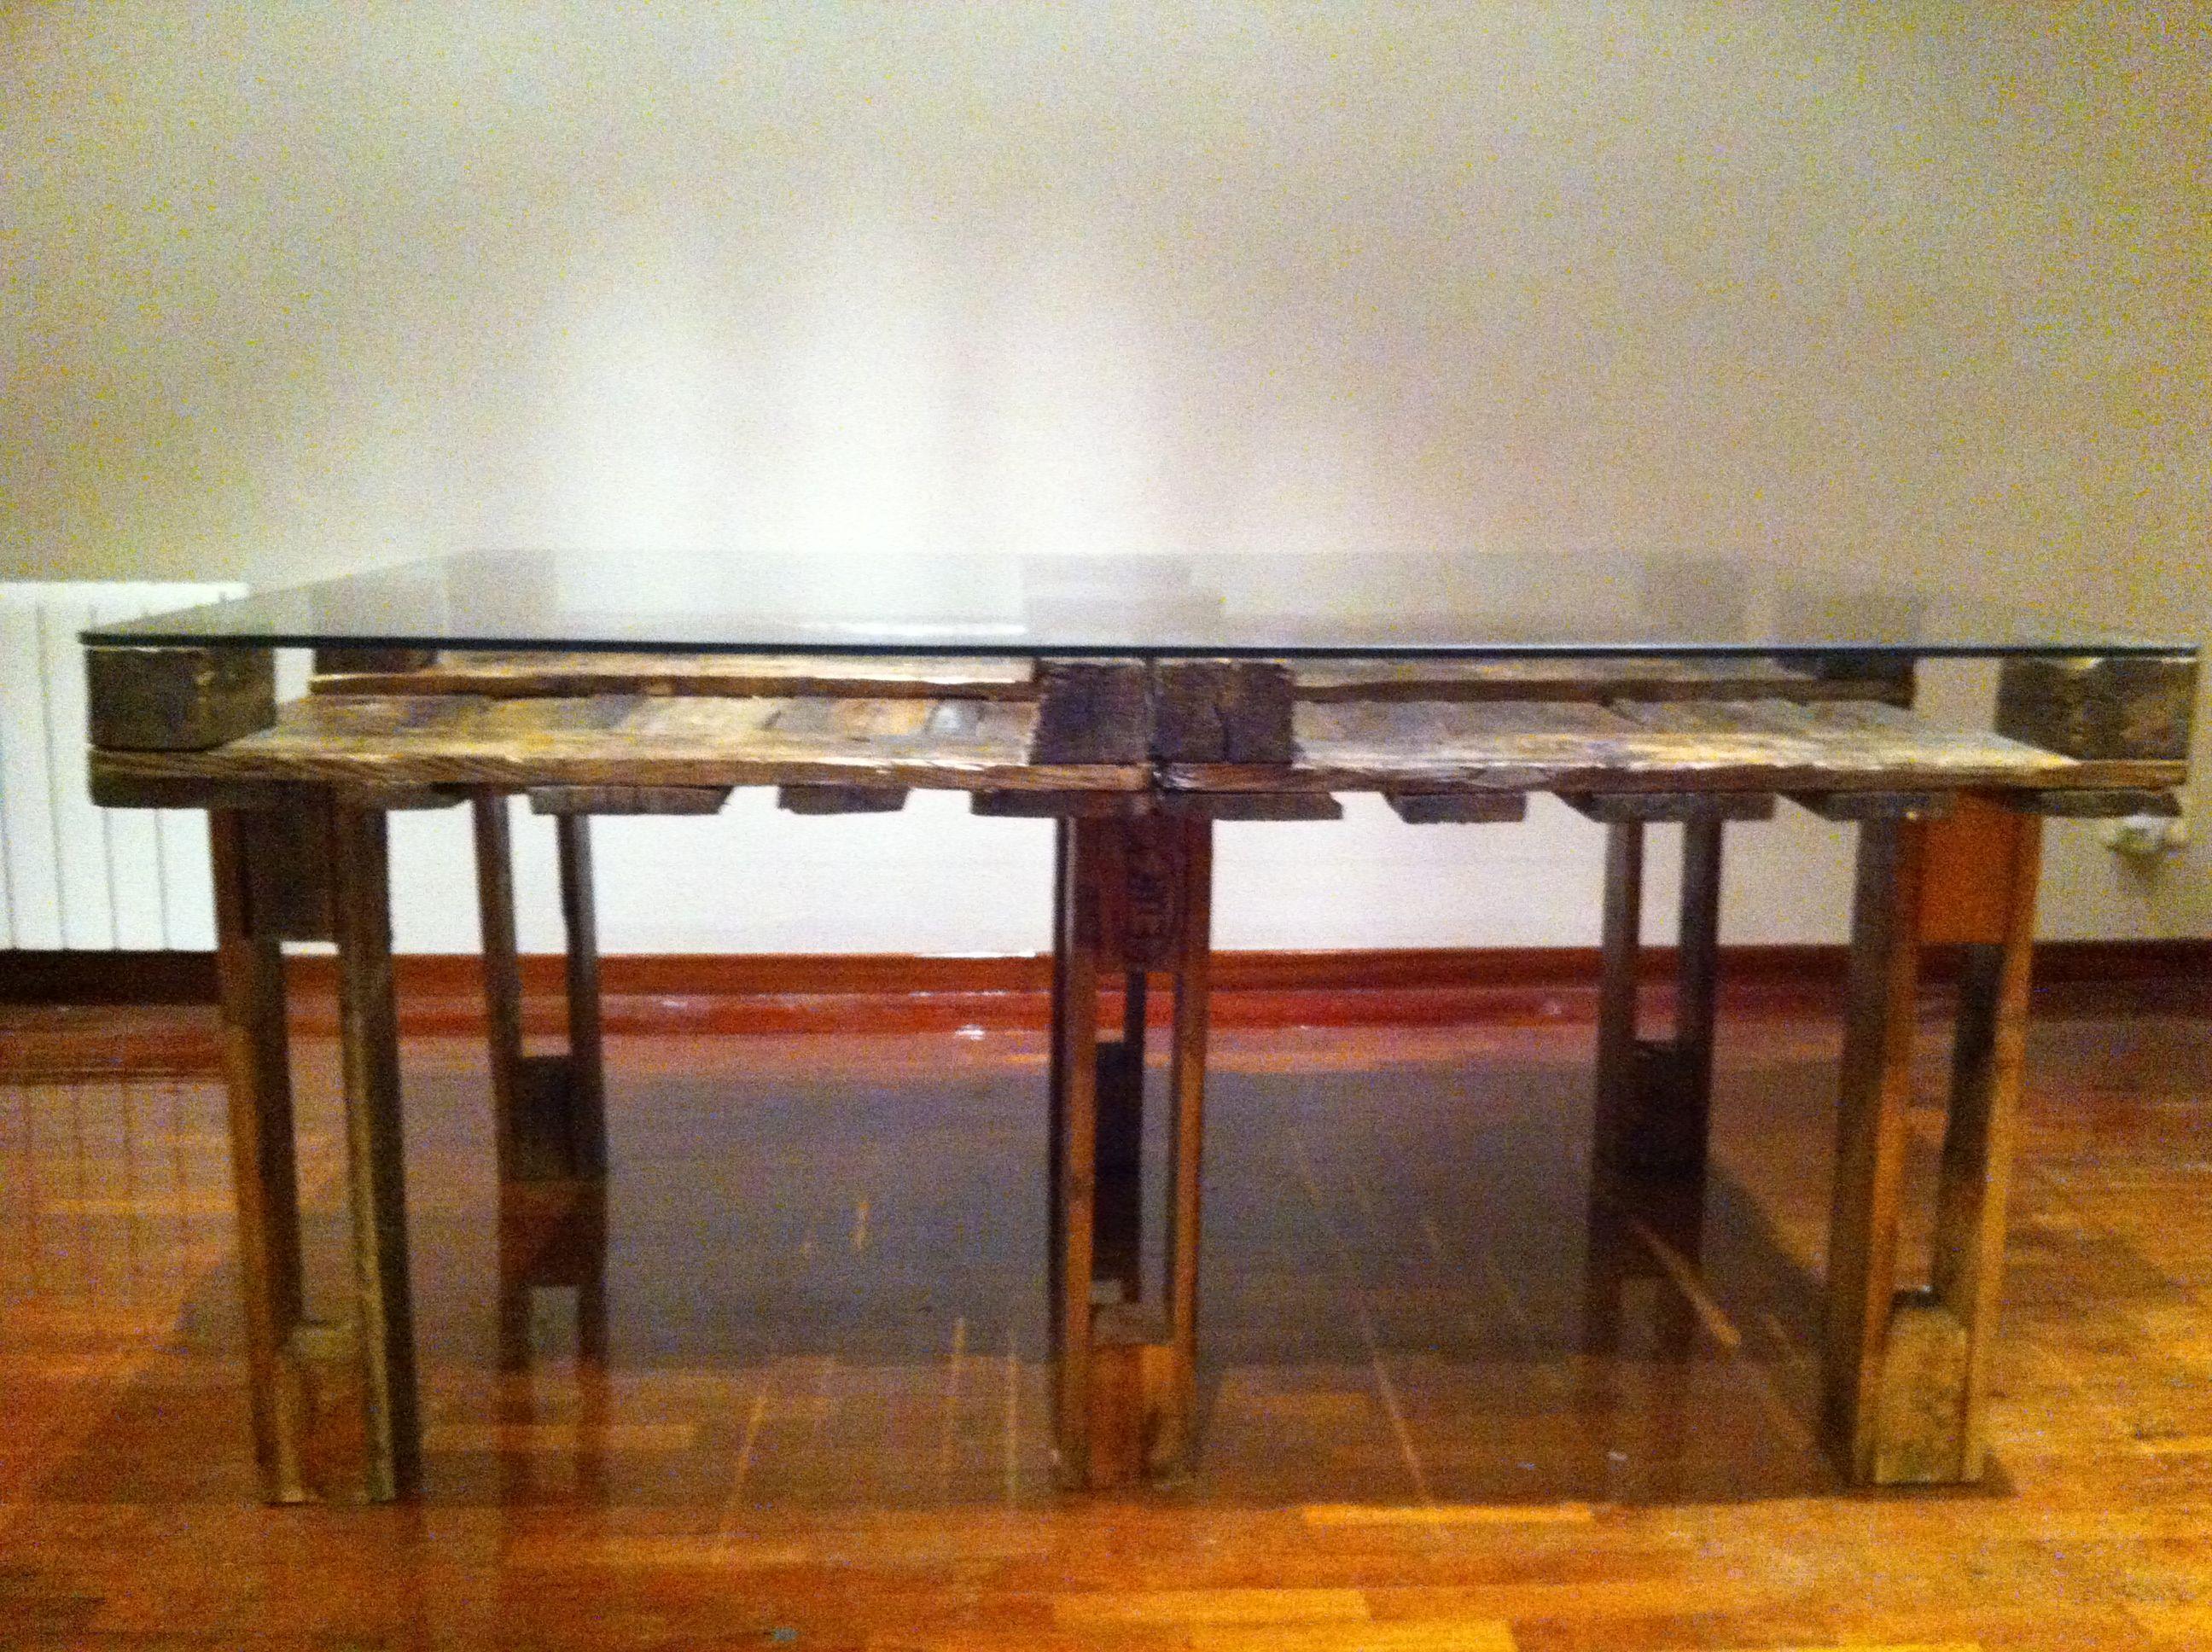 Mesa de comedor con palets reciclados 120x160 idees - Mesa de palets ...